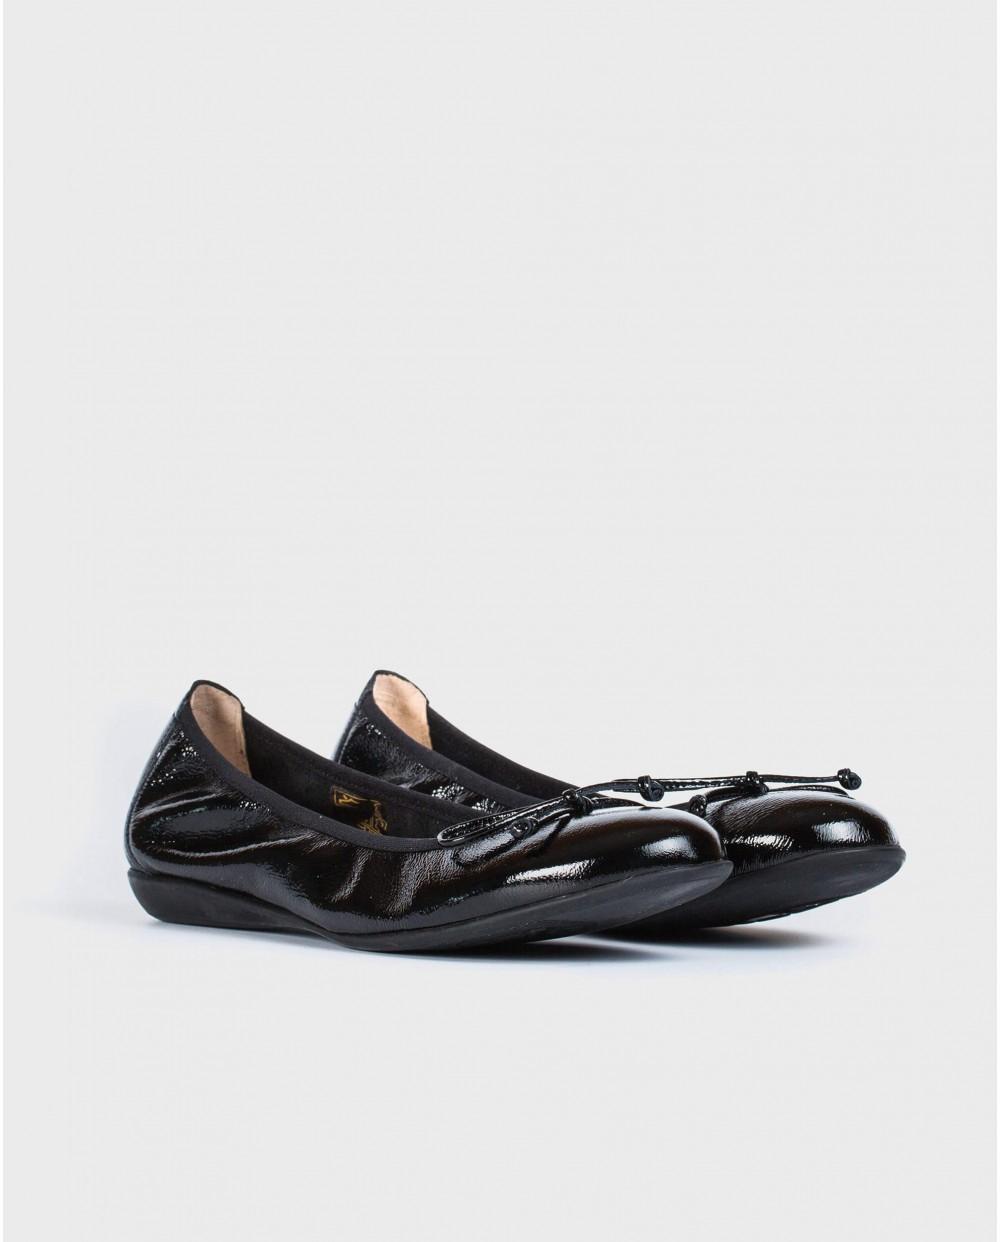 Wonders-Flat Shoes-Elastic band ballet pump